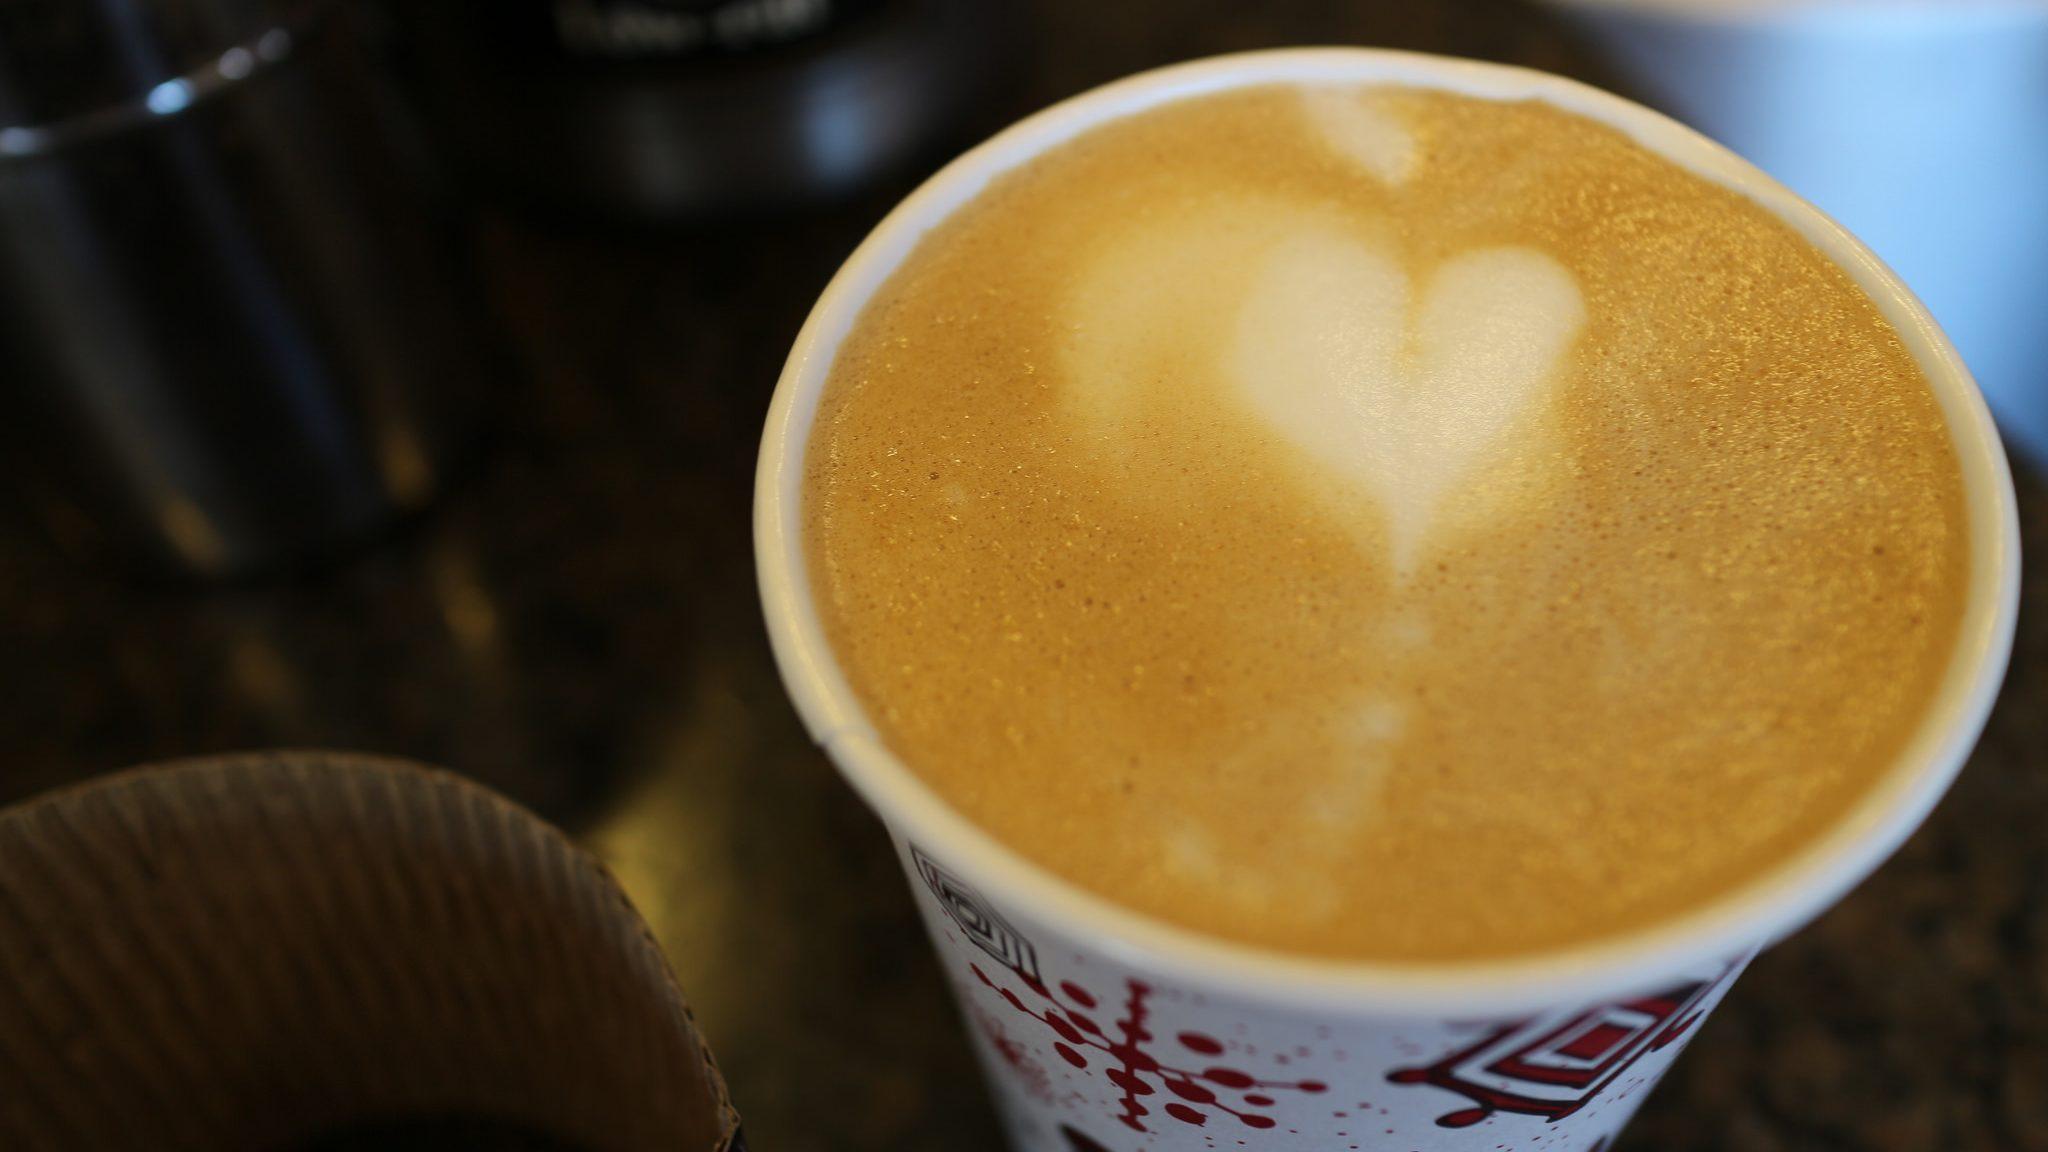 A cinnamon latte.